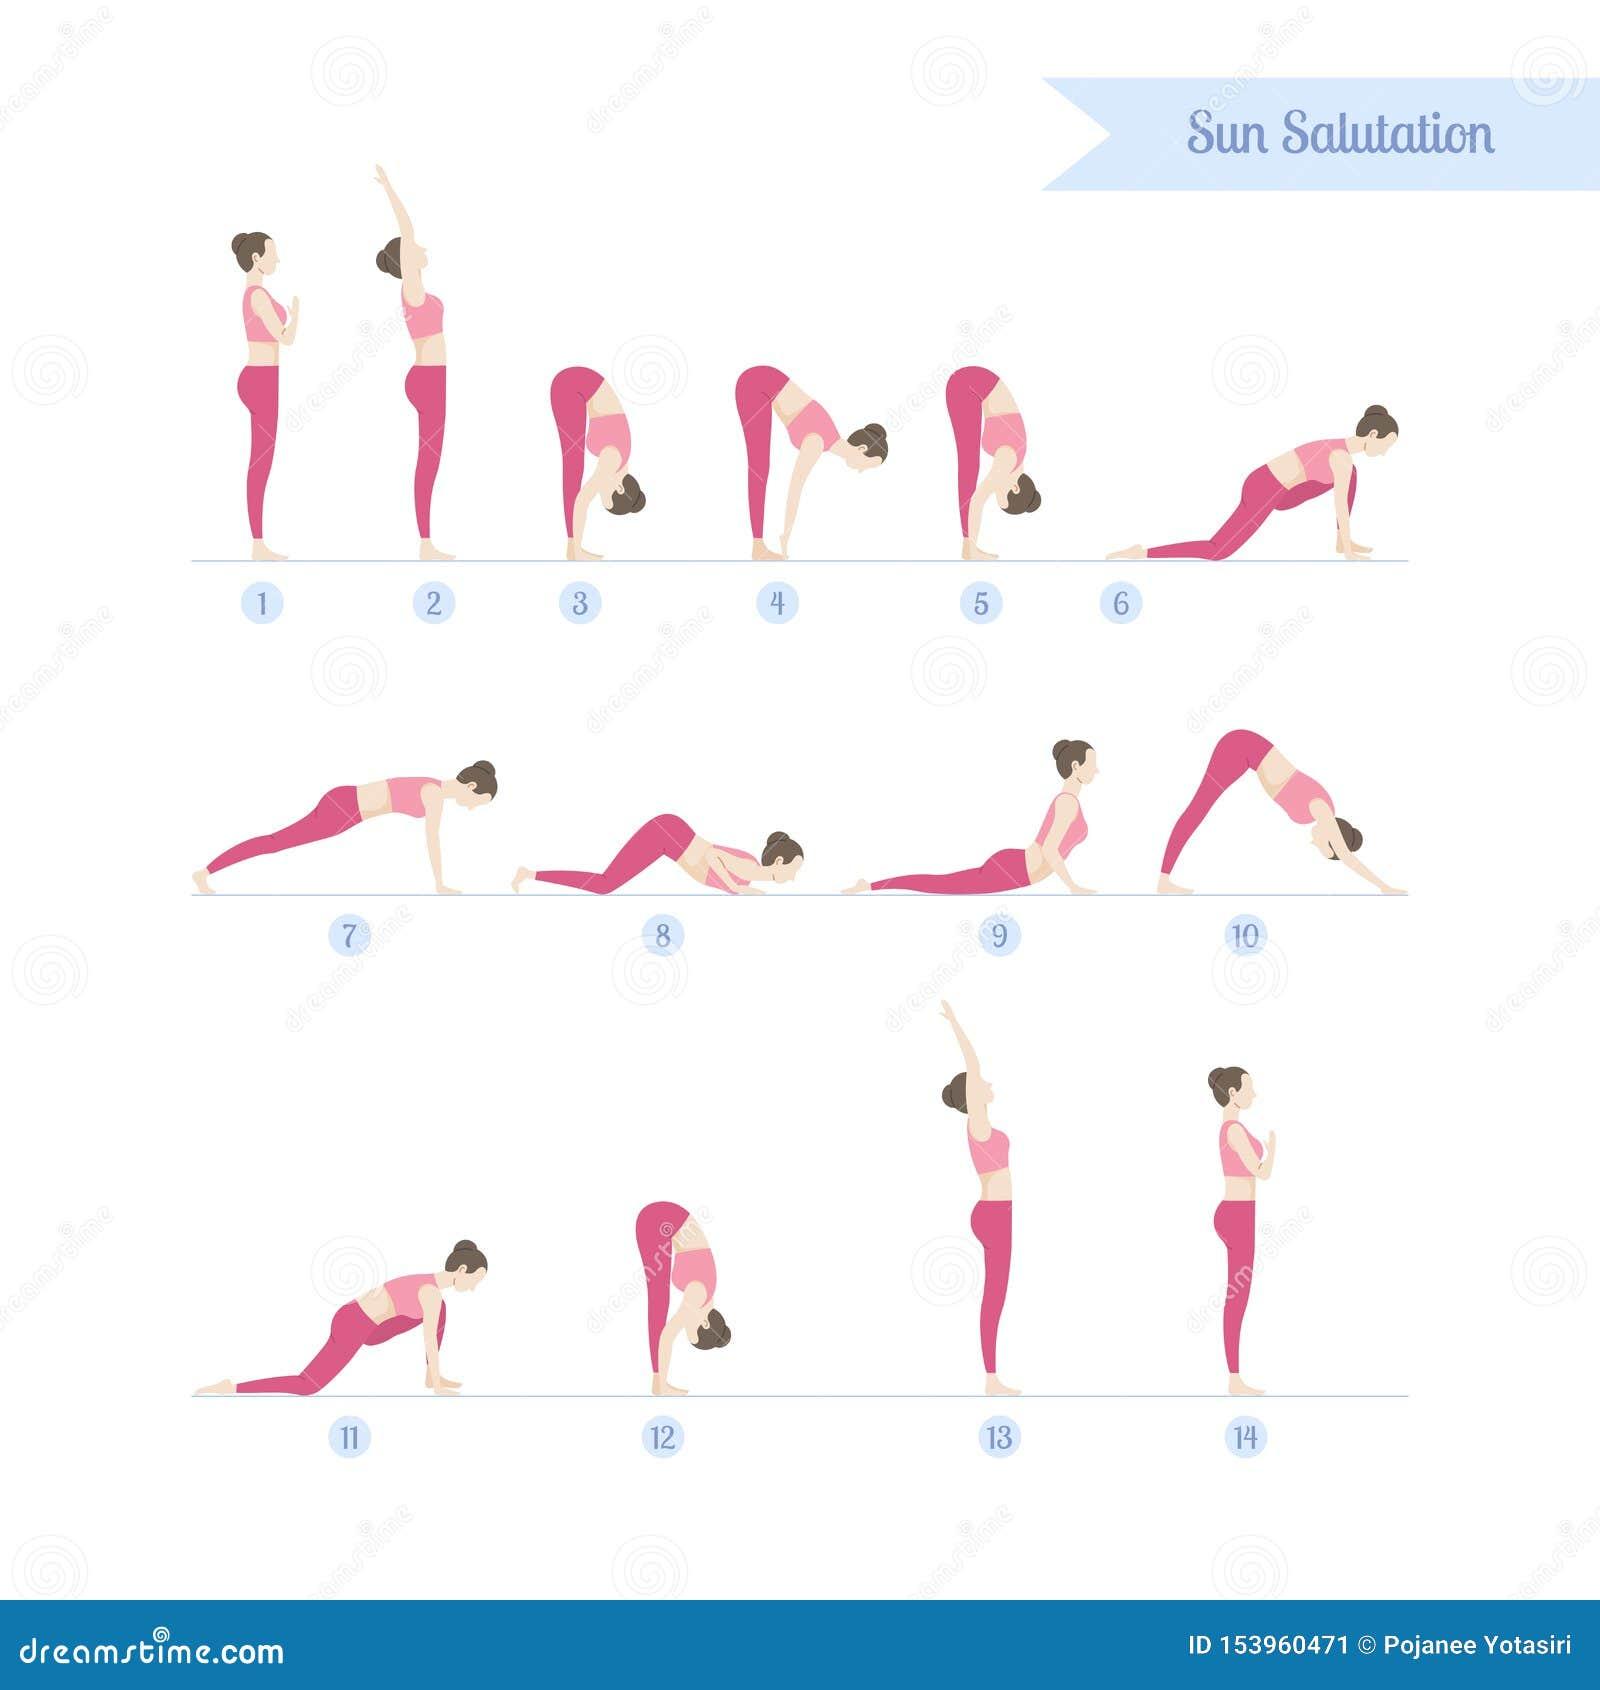 Yoga Practice Set Steps To Sun Salutations Or Surya Namaskar Stock Vector Illustration Of Activity Flexibility 153960471